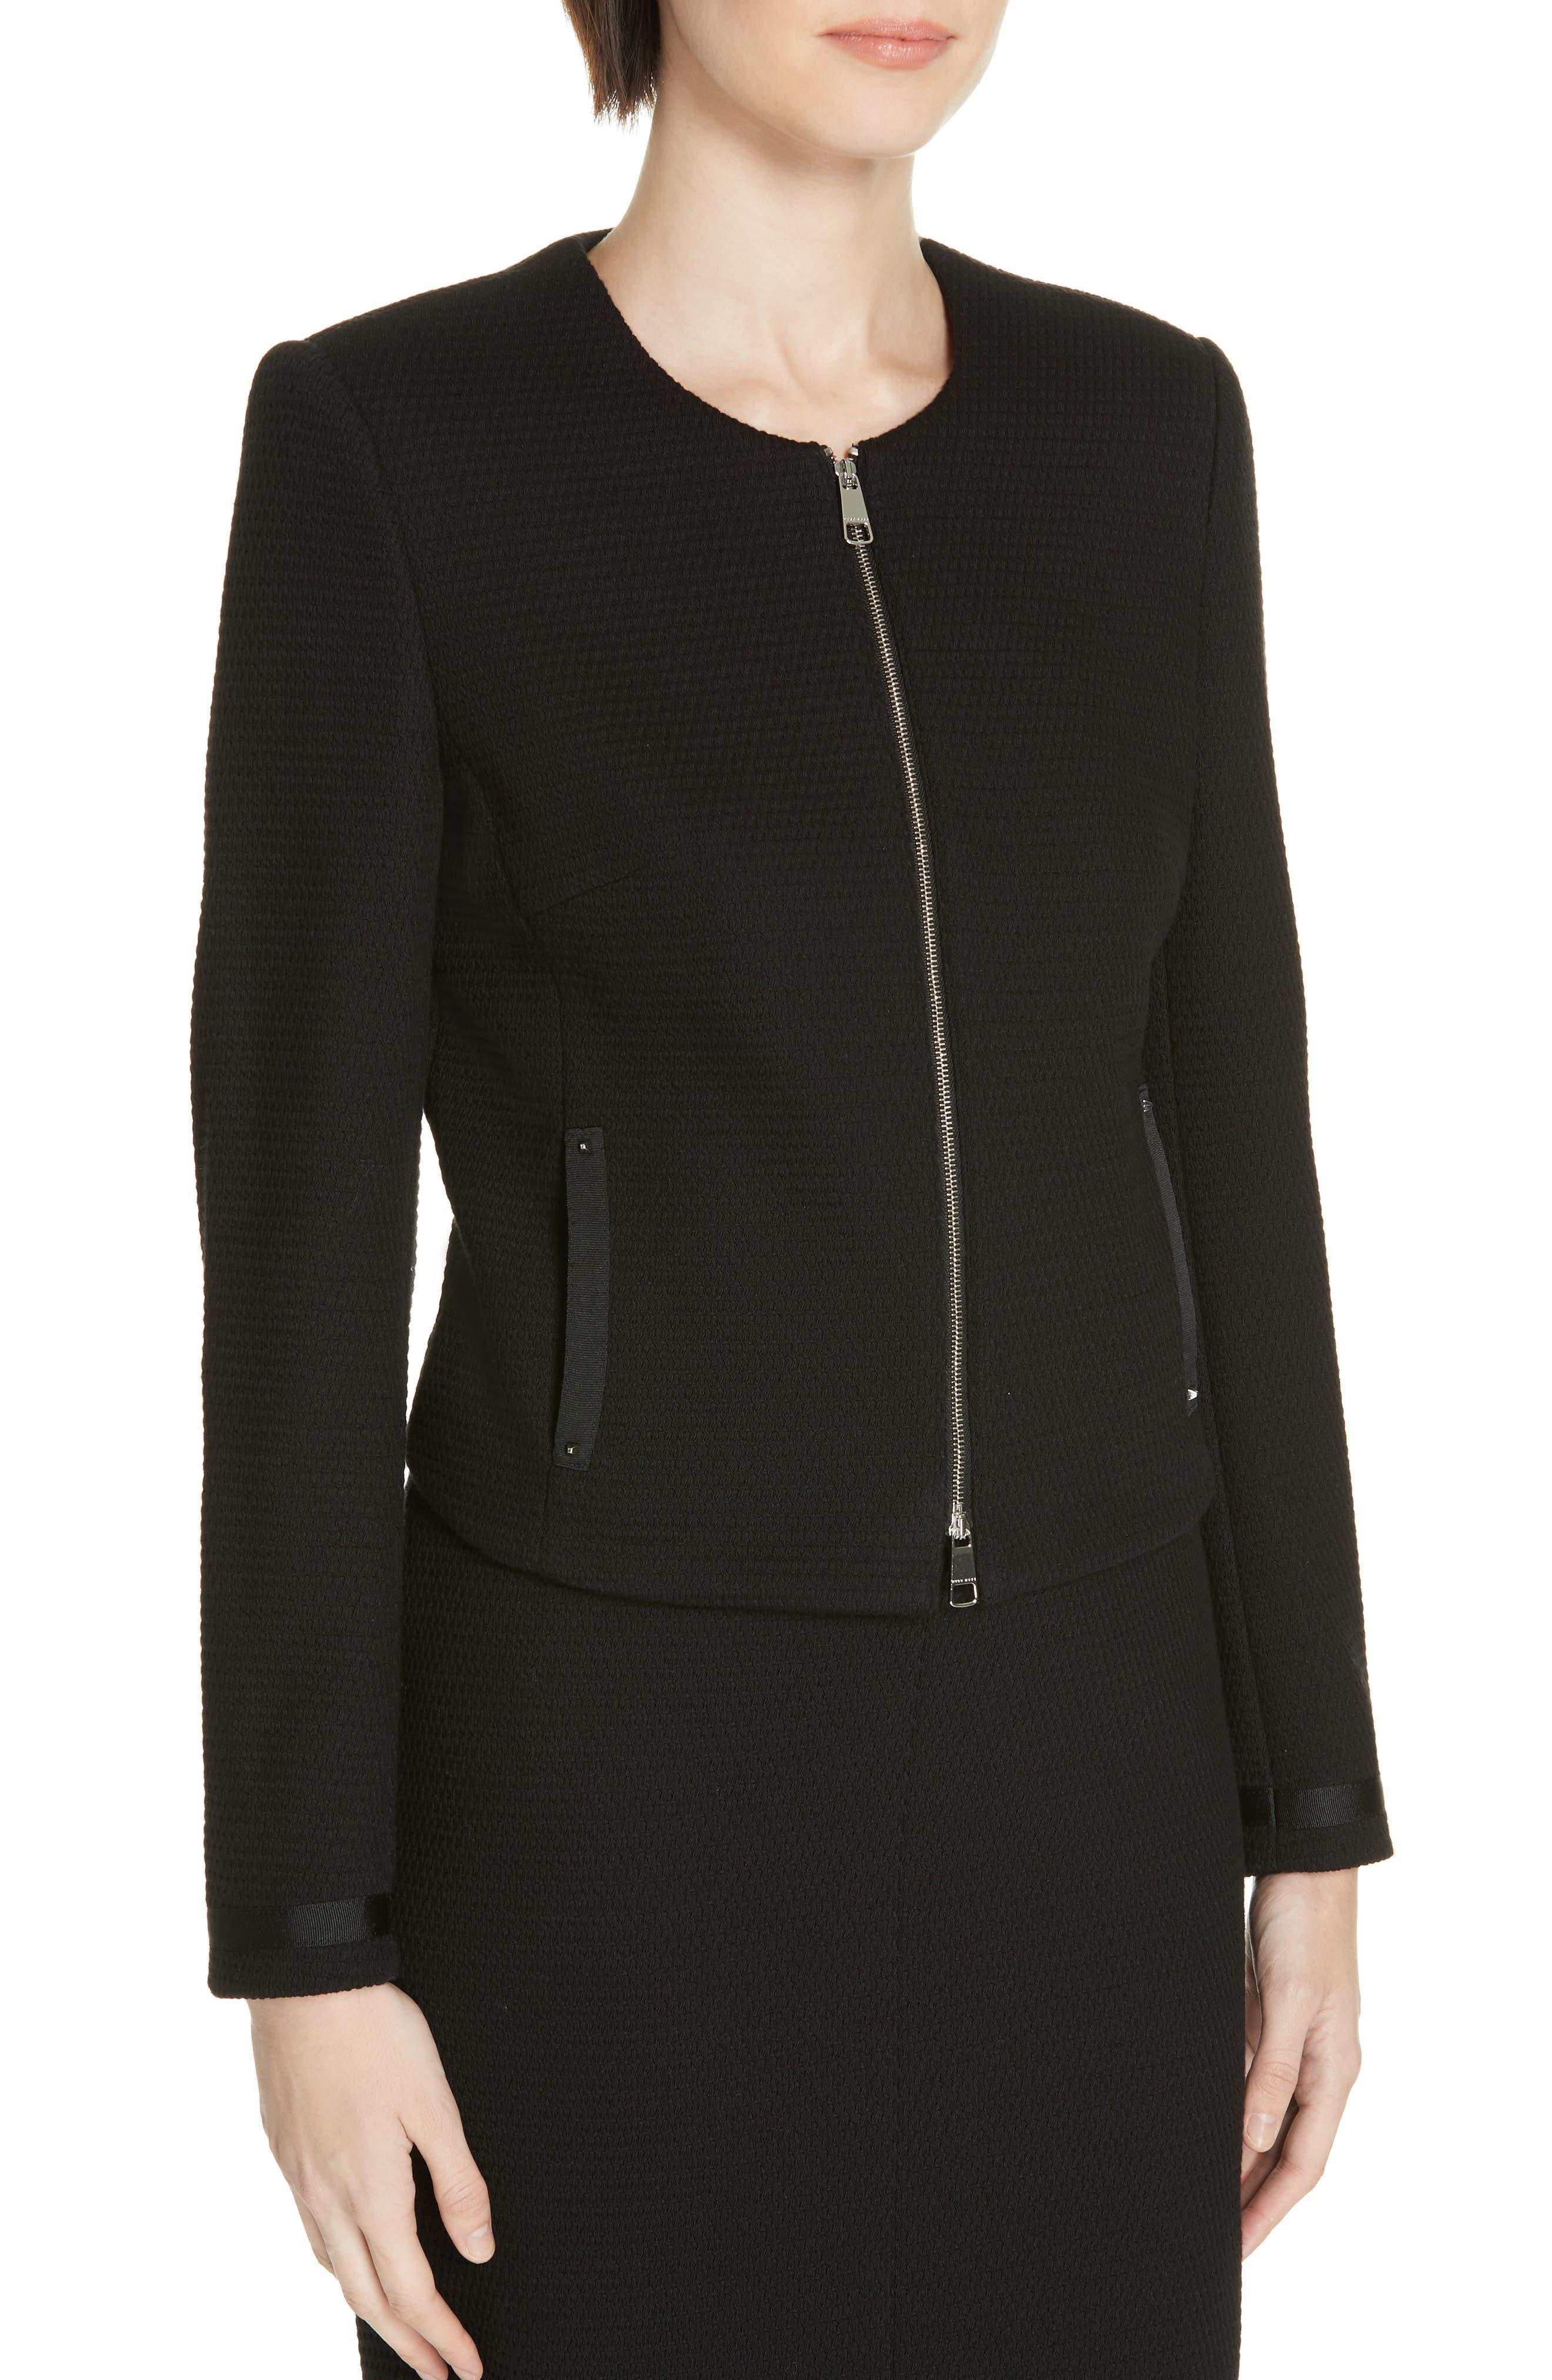 Kemio Textured Jersey Suit Jacket,                             Alternate thumbnail 4, color,                             BLACK